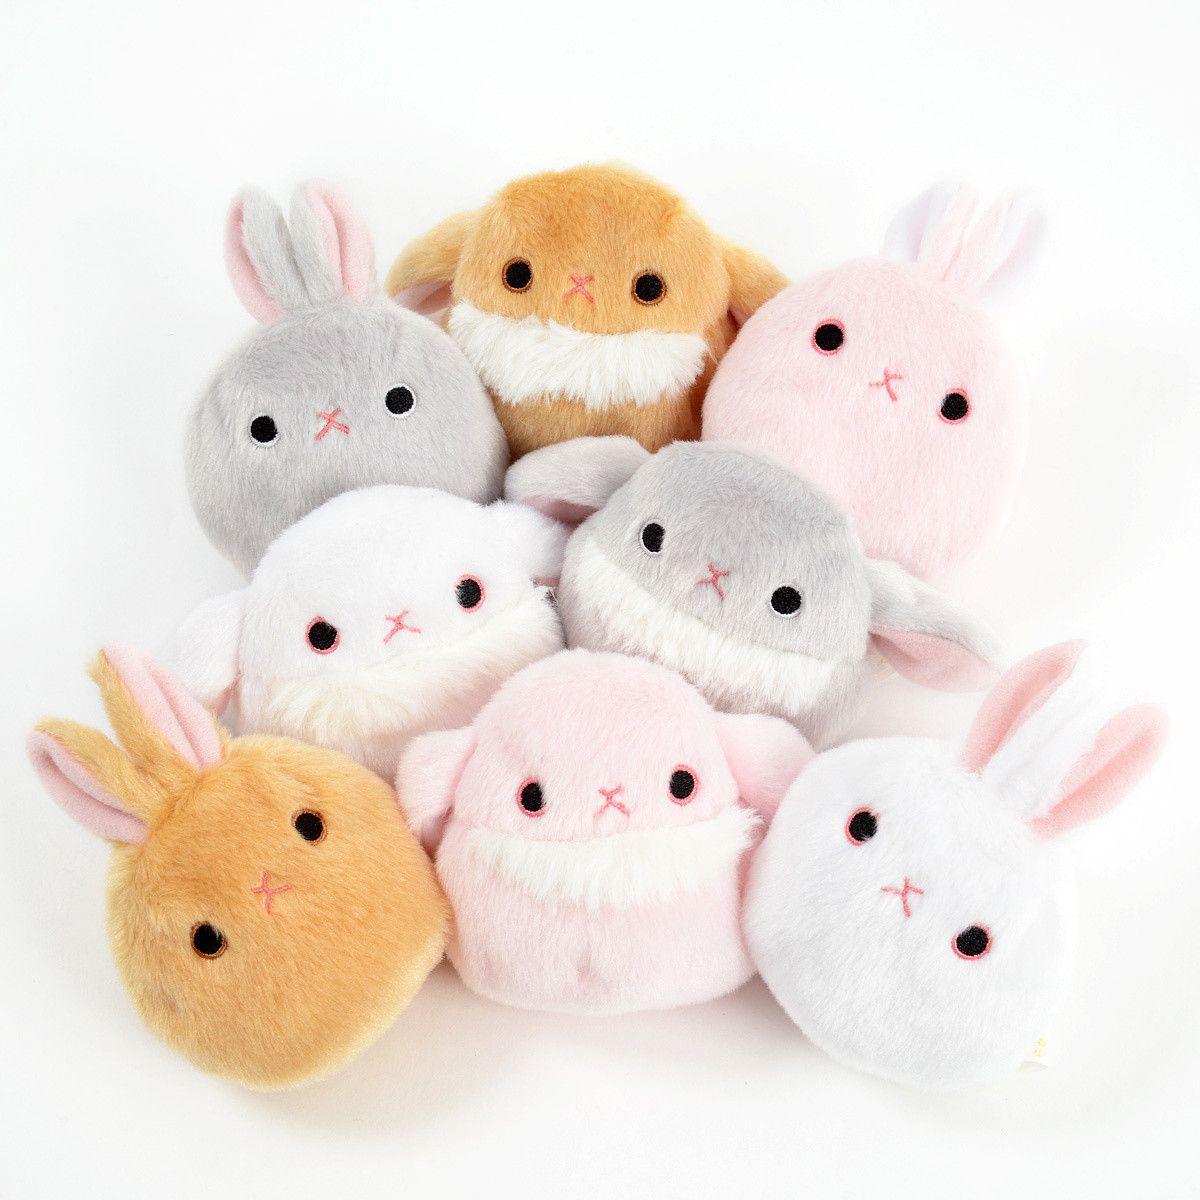 Rabi-dango Plush Collection | Kawaii plush, Cute stuffed ...